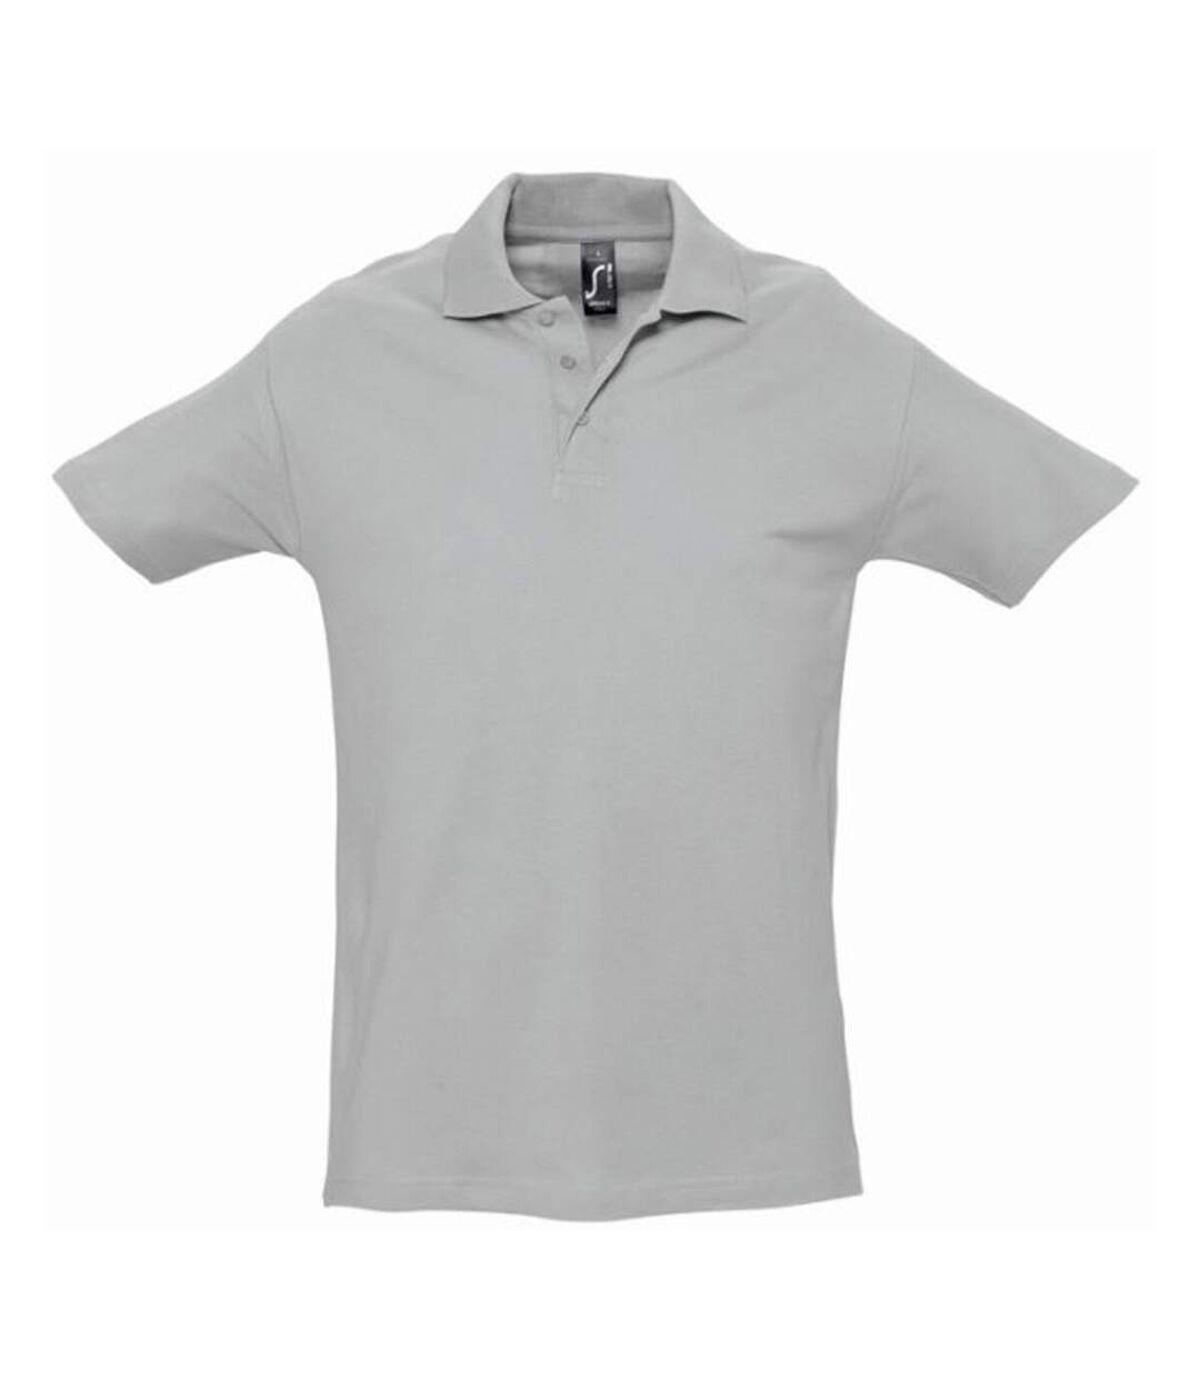 SOLS Mens Spring II Short Sleeve Heavyweight Polo Shirt (Grey Marl) - UTPC320